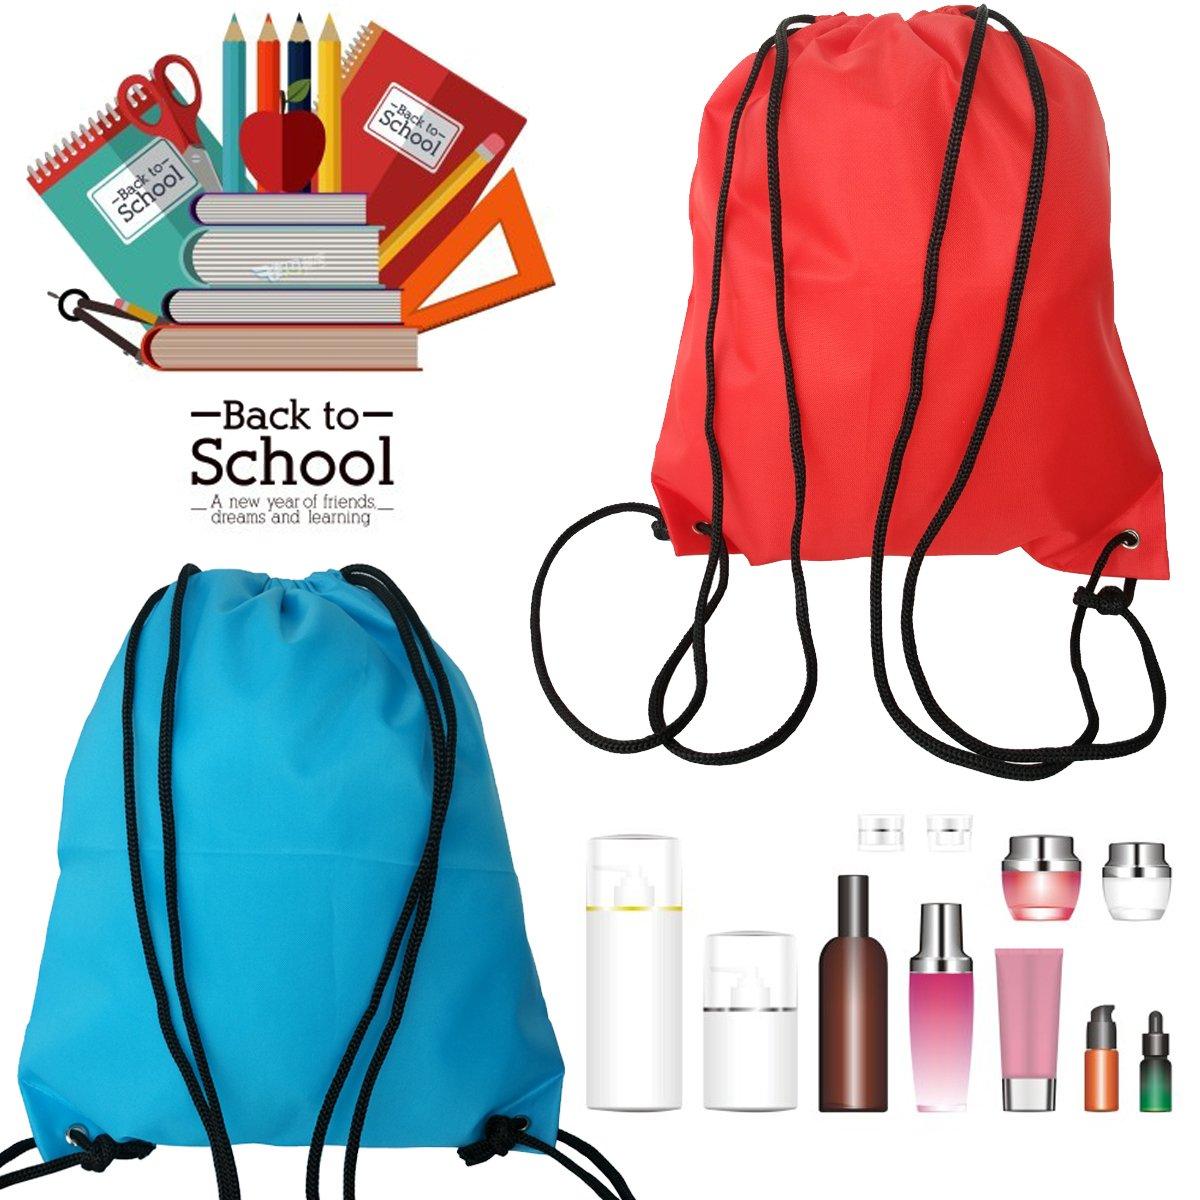 6 Pack Drawstring Backpack Bags 420D polyester fabric Folding Shoulder Cinch Bag by Topspeeder (Image #6)